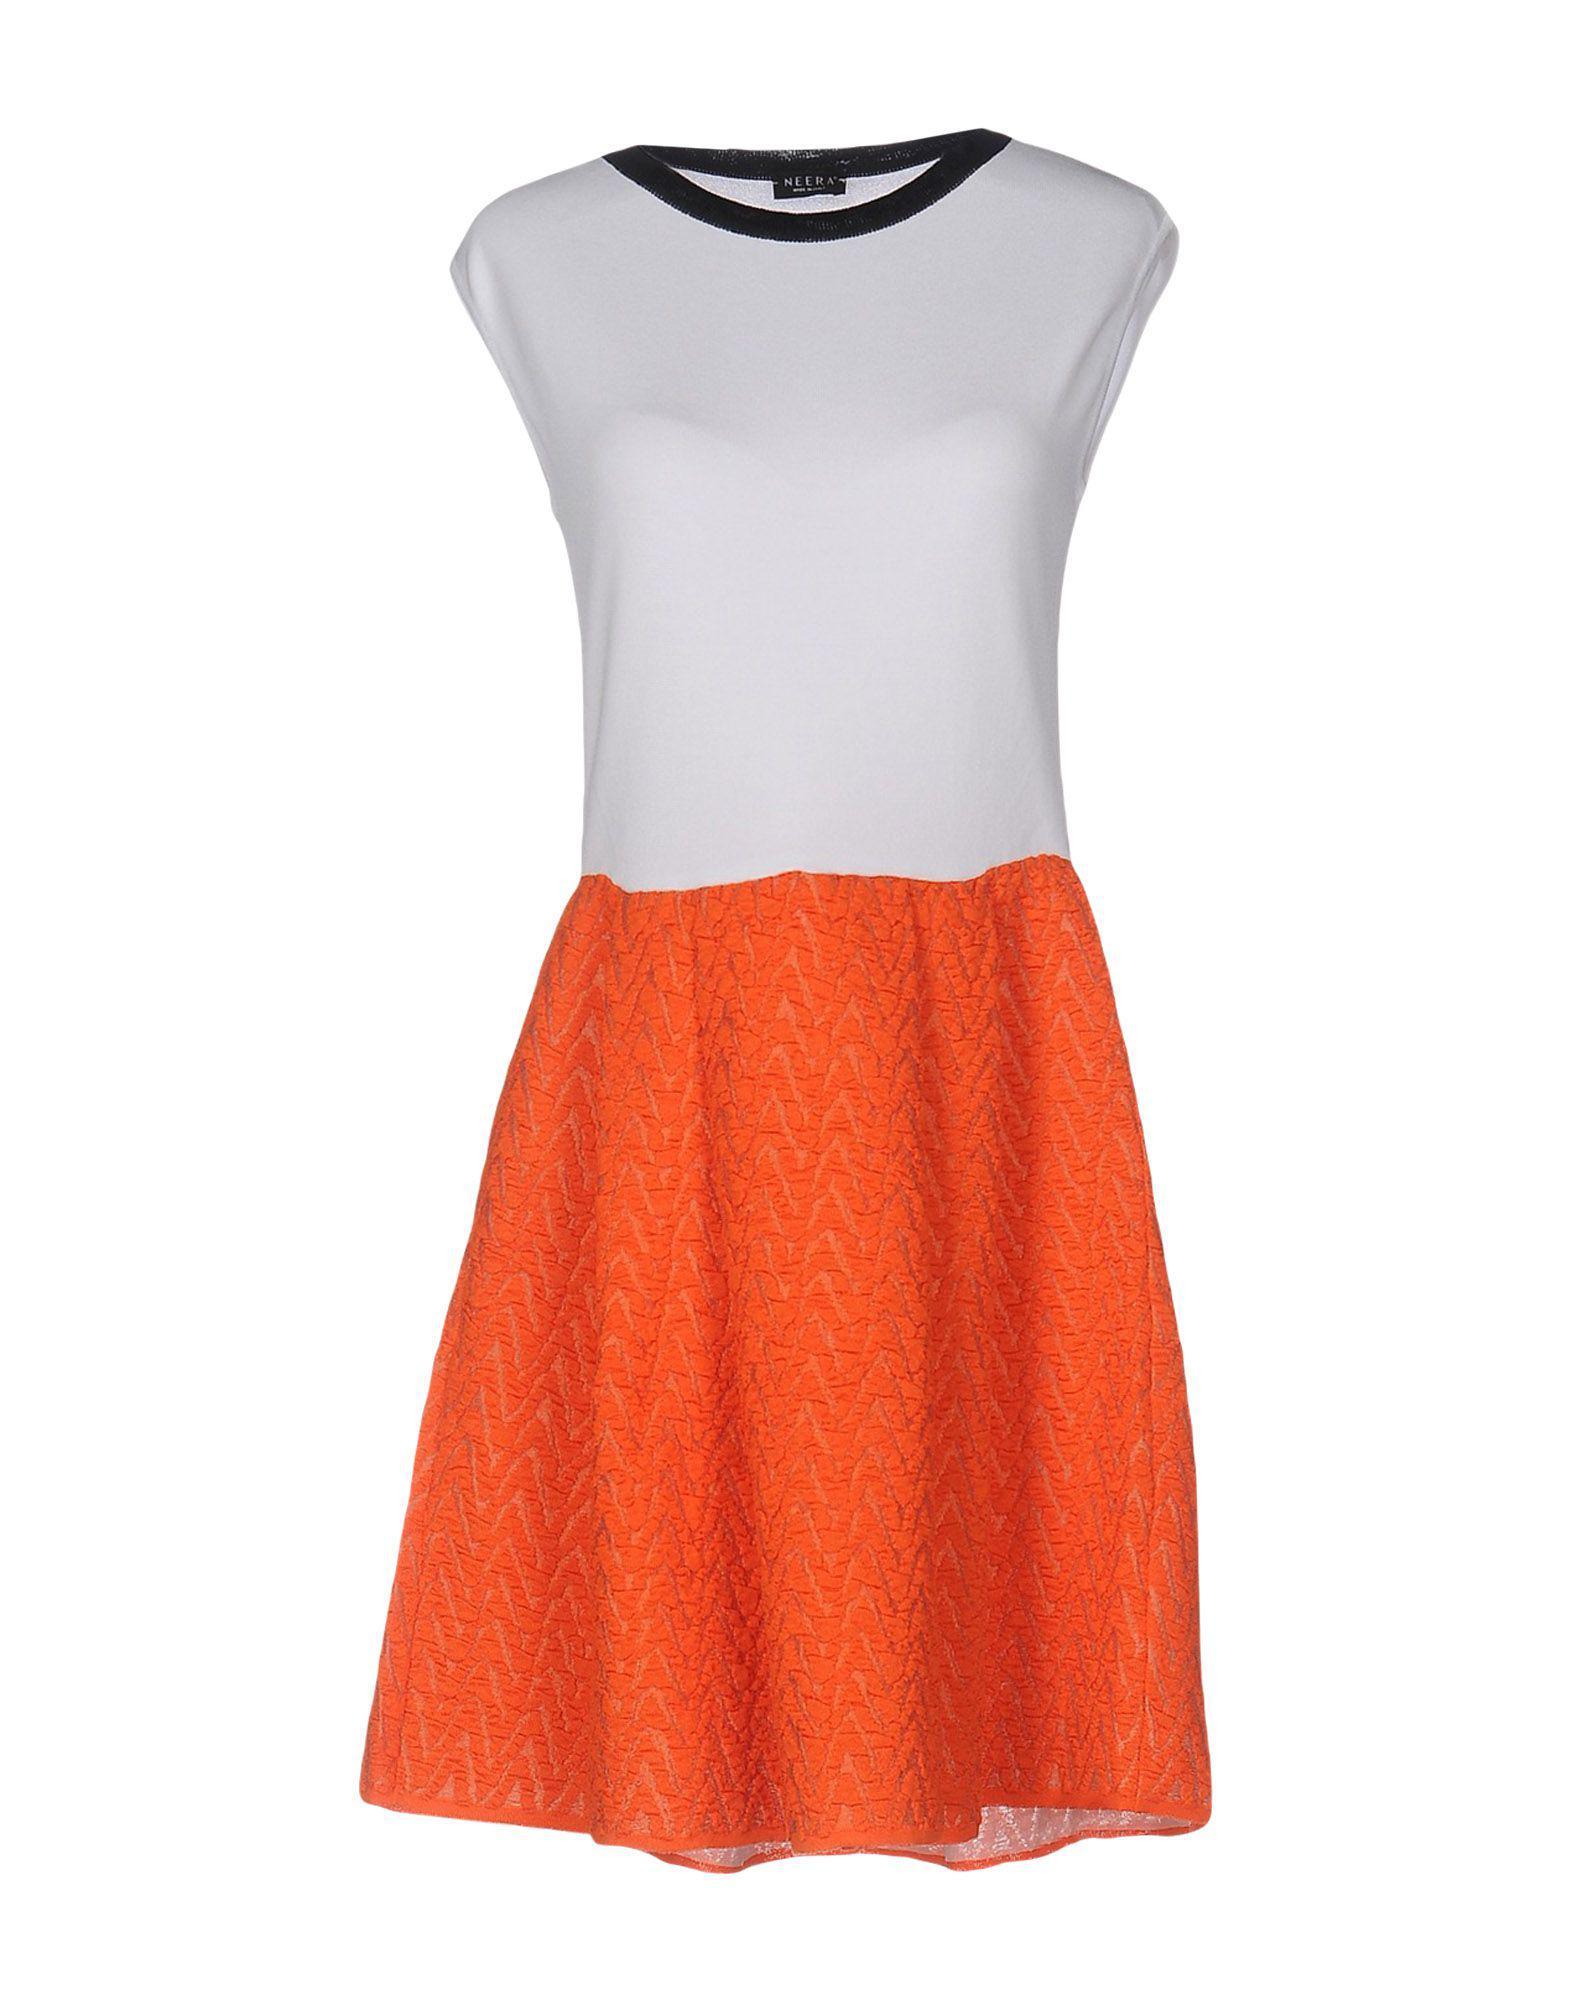 DRESSES - Short dresses Neera 9Mr4F